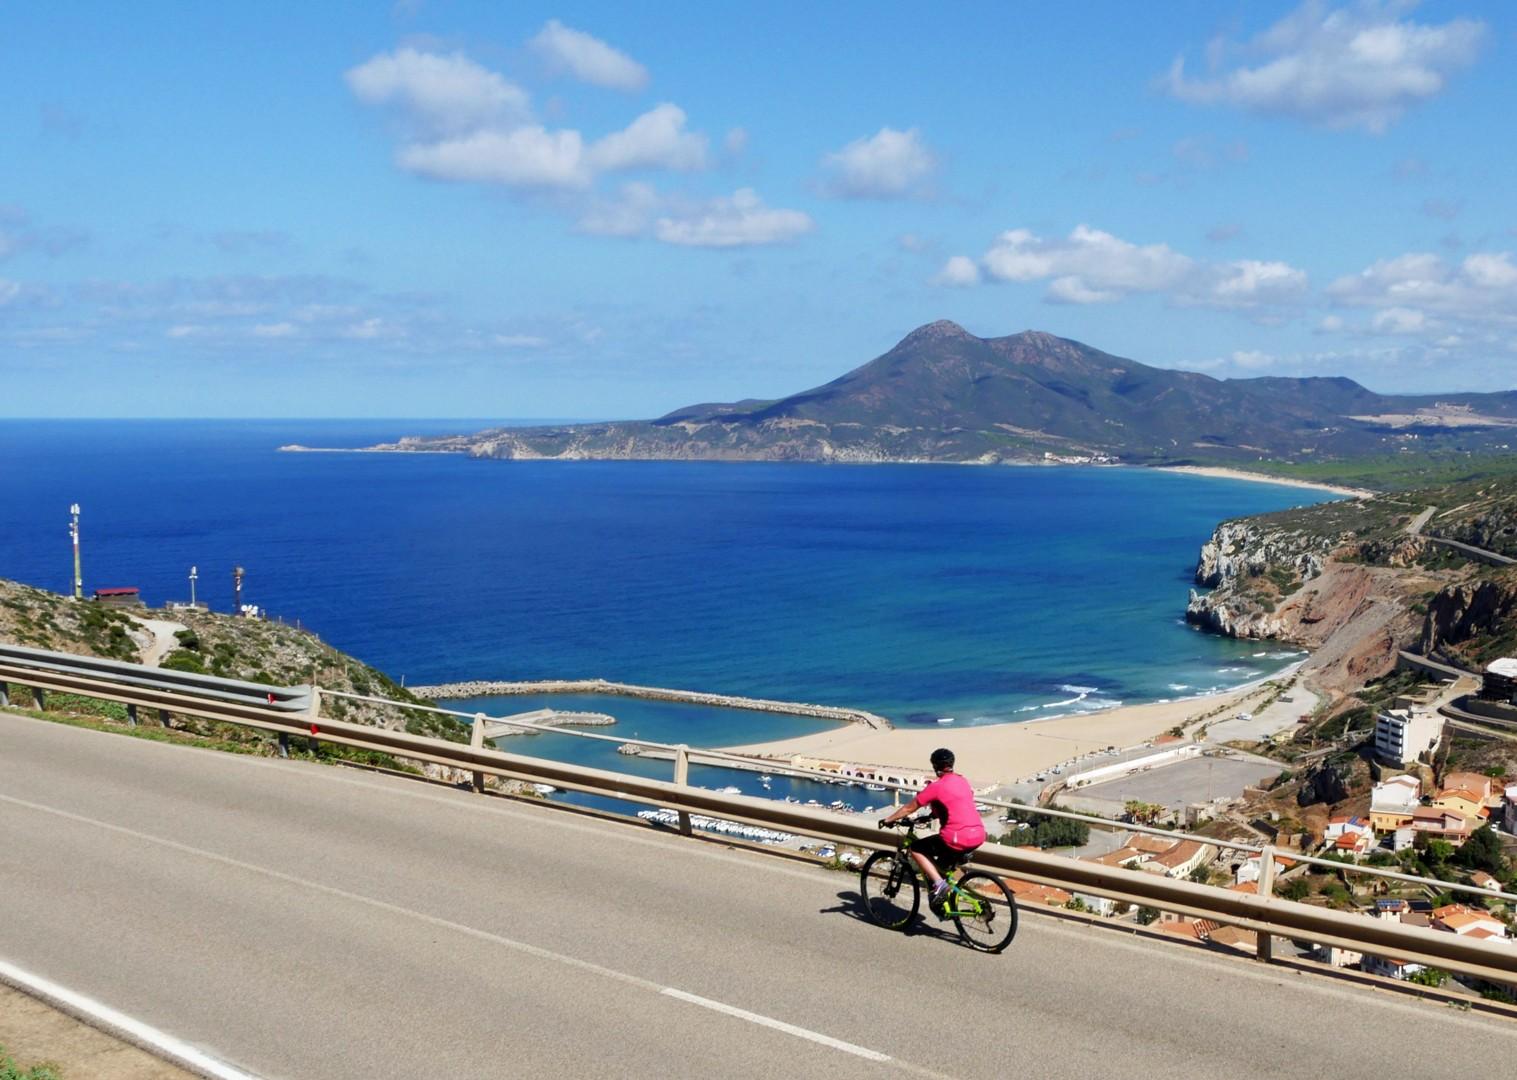 sardinia-island-cycling-holiday.jpg - Italy - Sardinia - Island Flavours - Leisure Cycling